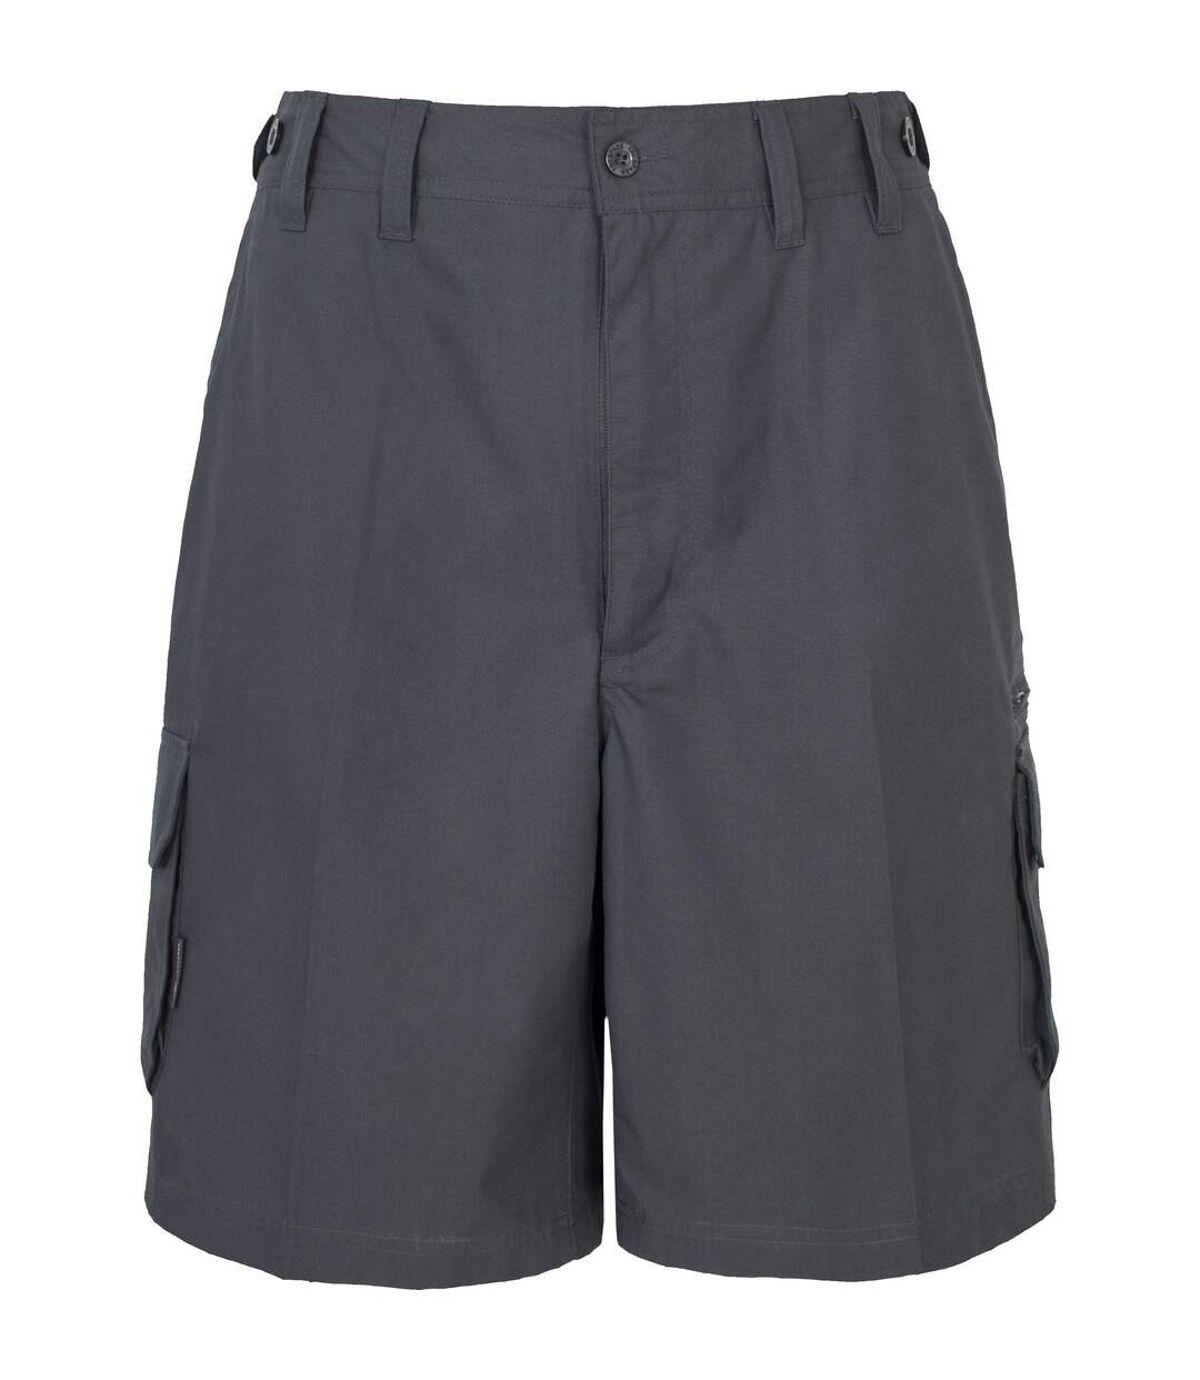 Trespass Mens Gally Water Repellent Hiking Cargo Shorts (Graphite) - UTTP230